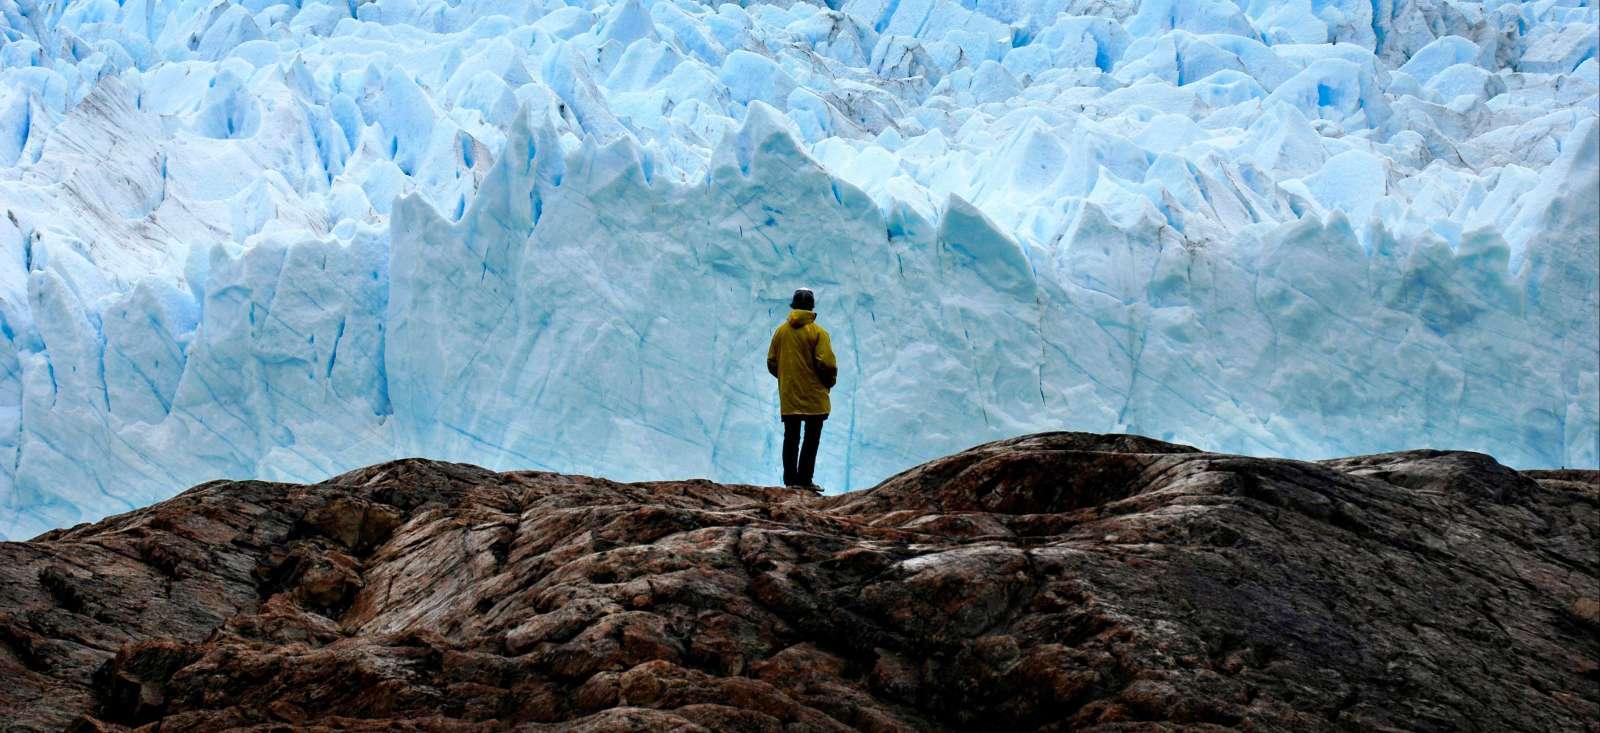 Voyage à pied Argentine : Argentine & Chili, rendez-vous en Patagonie